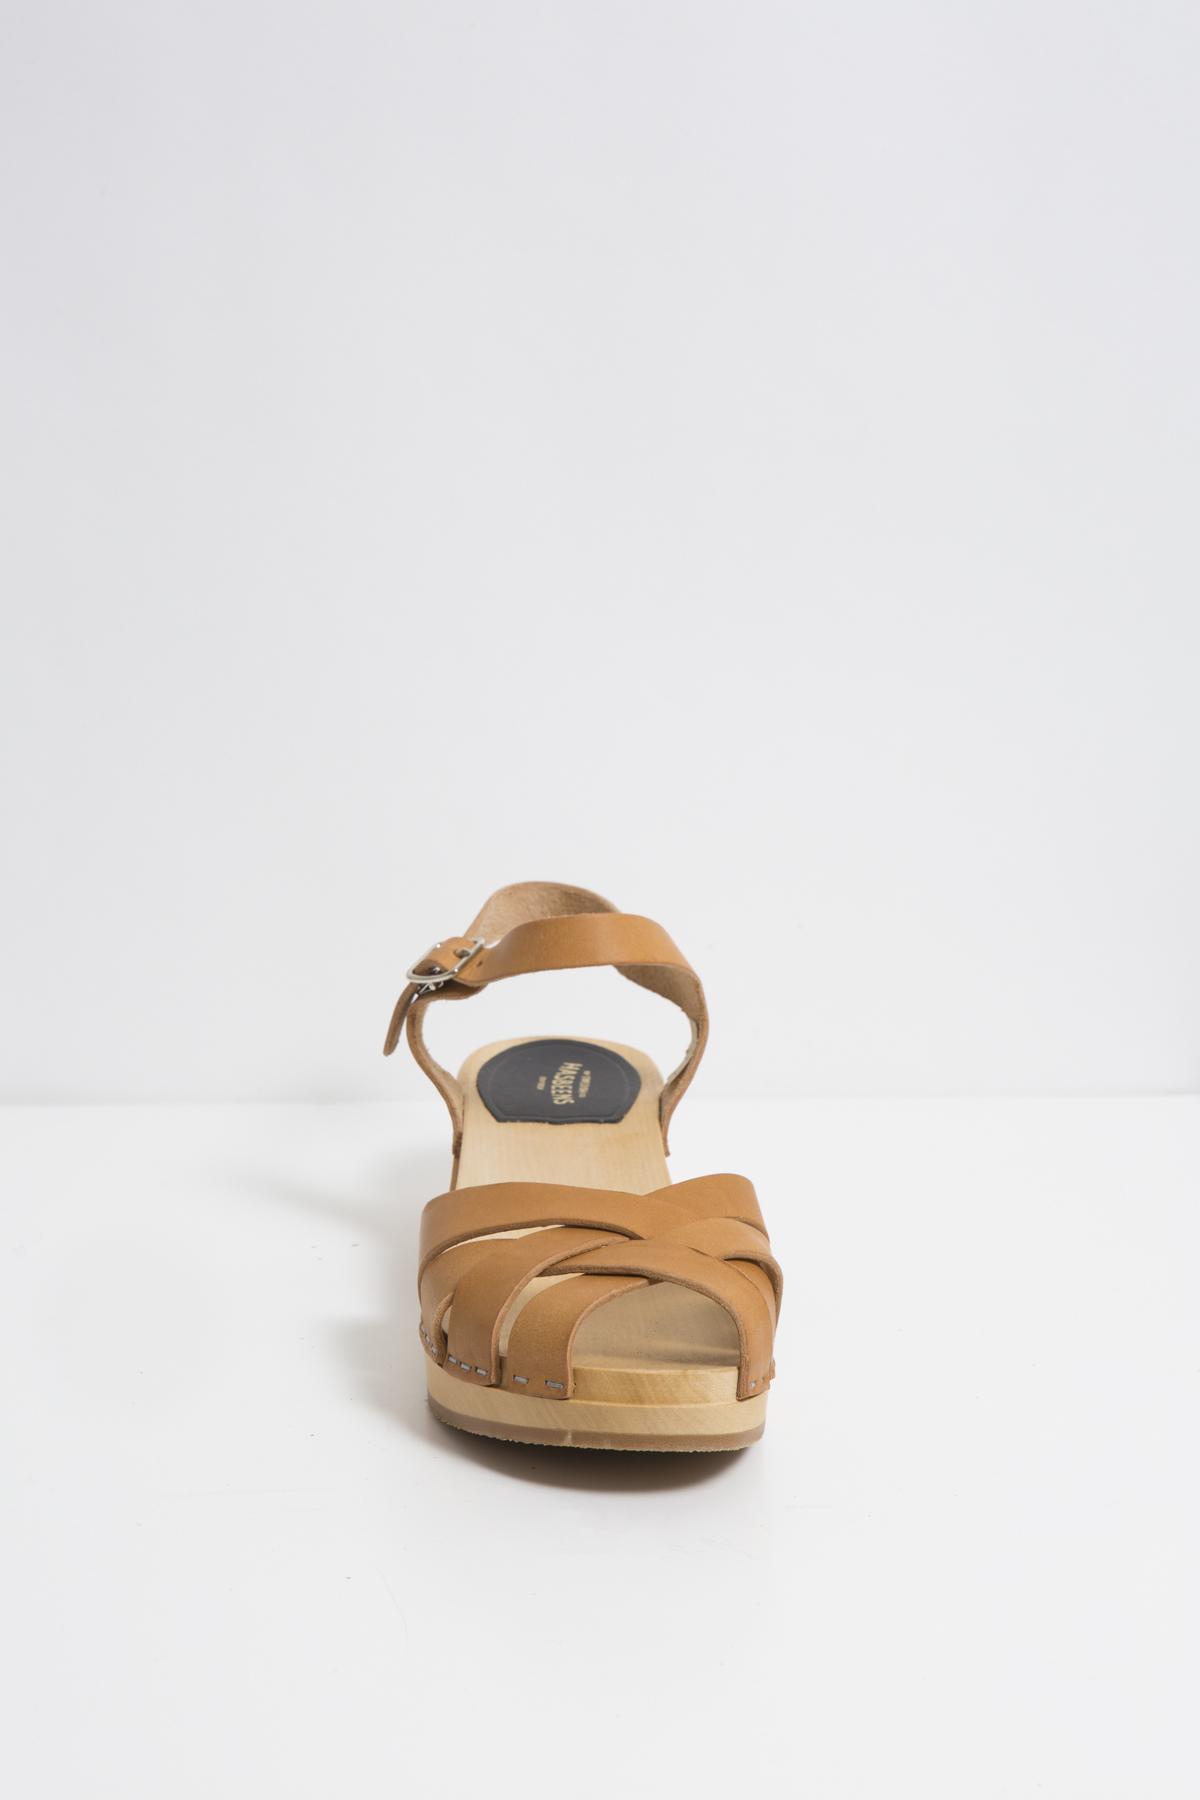 magdalena-nature-clog-sweedish-hasbeens-matchboxathens